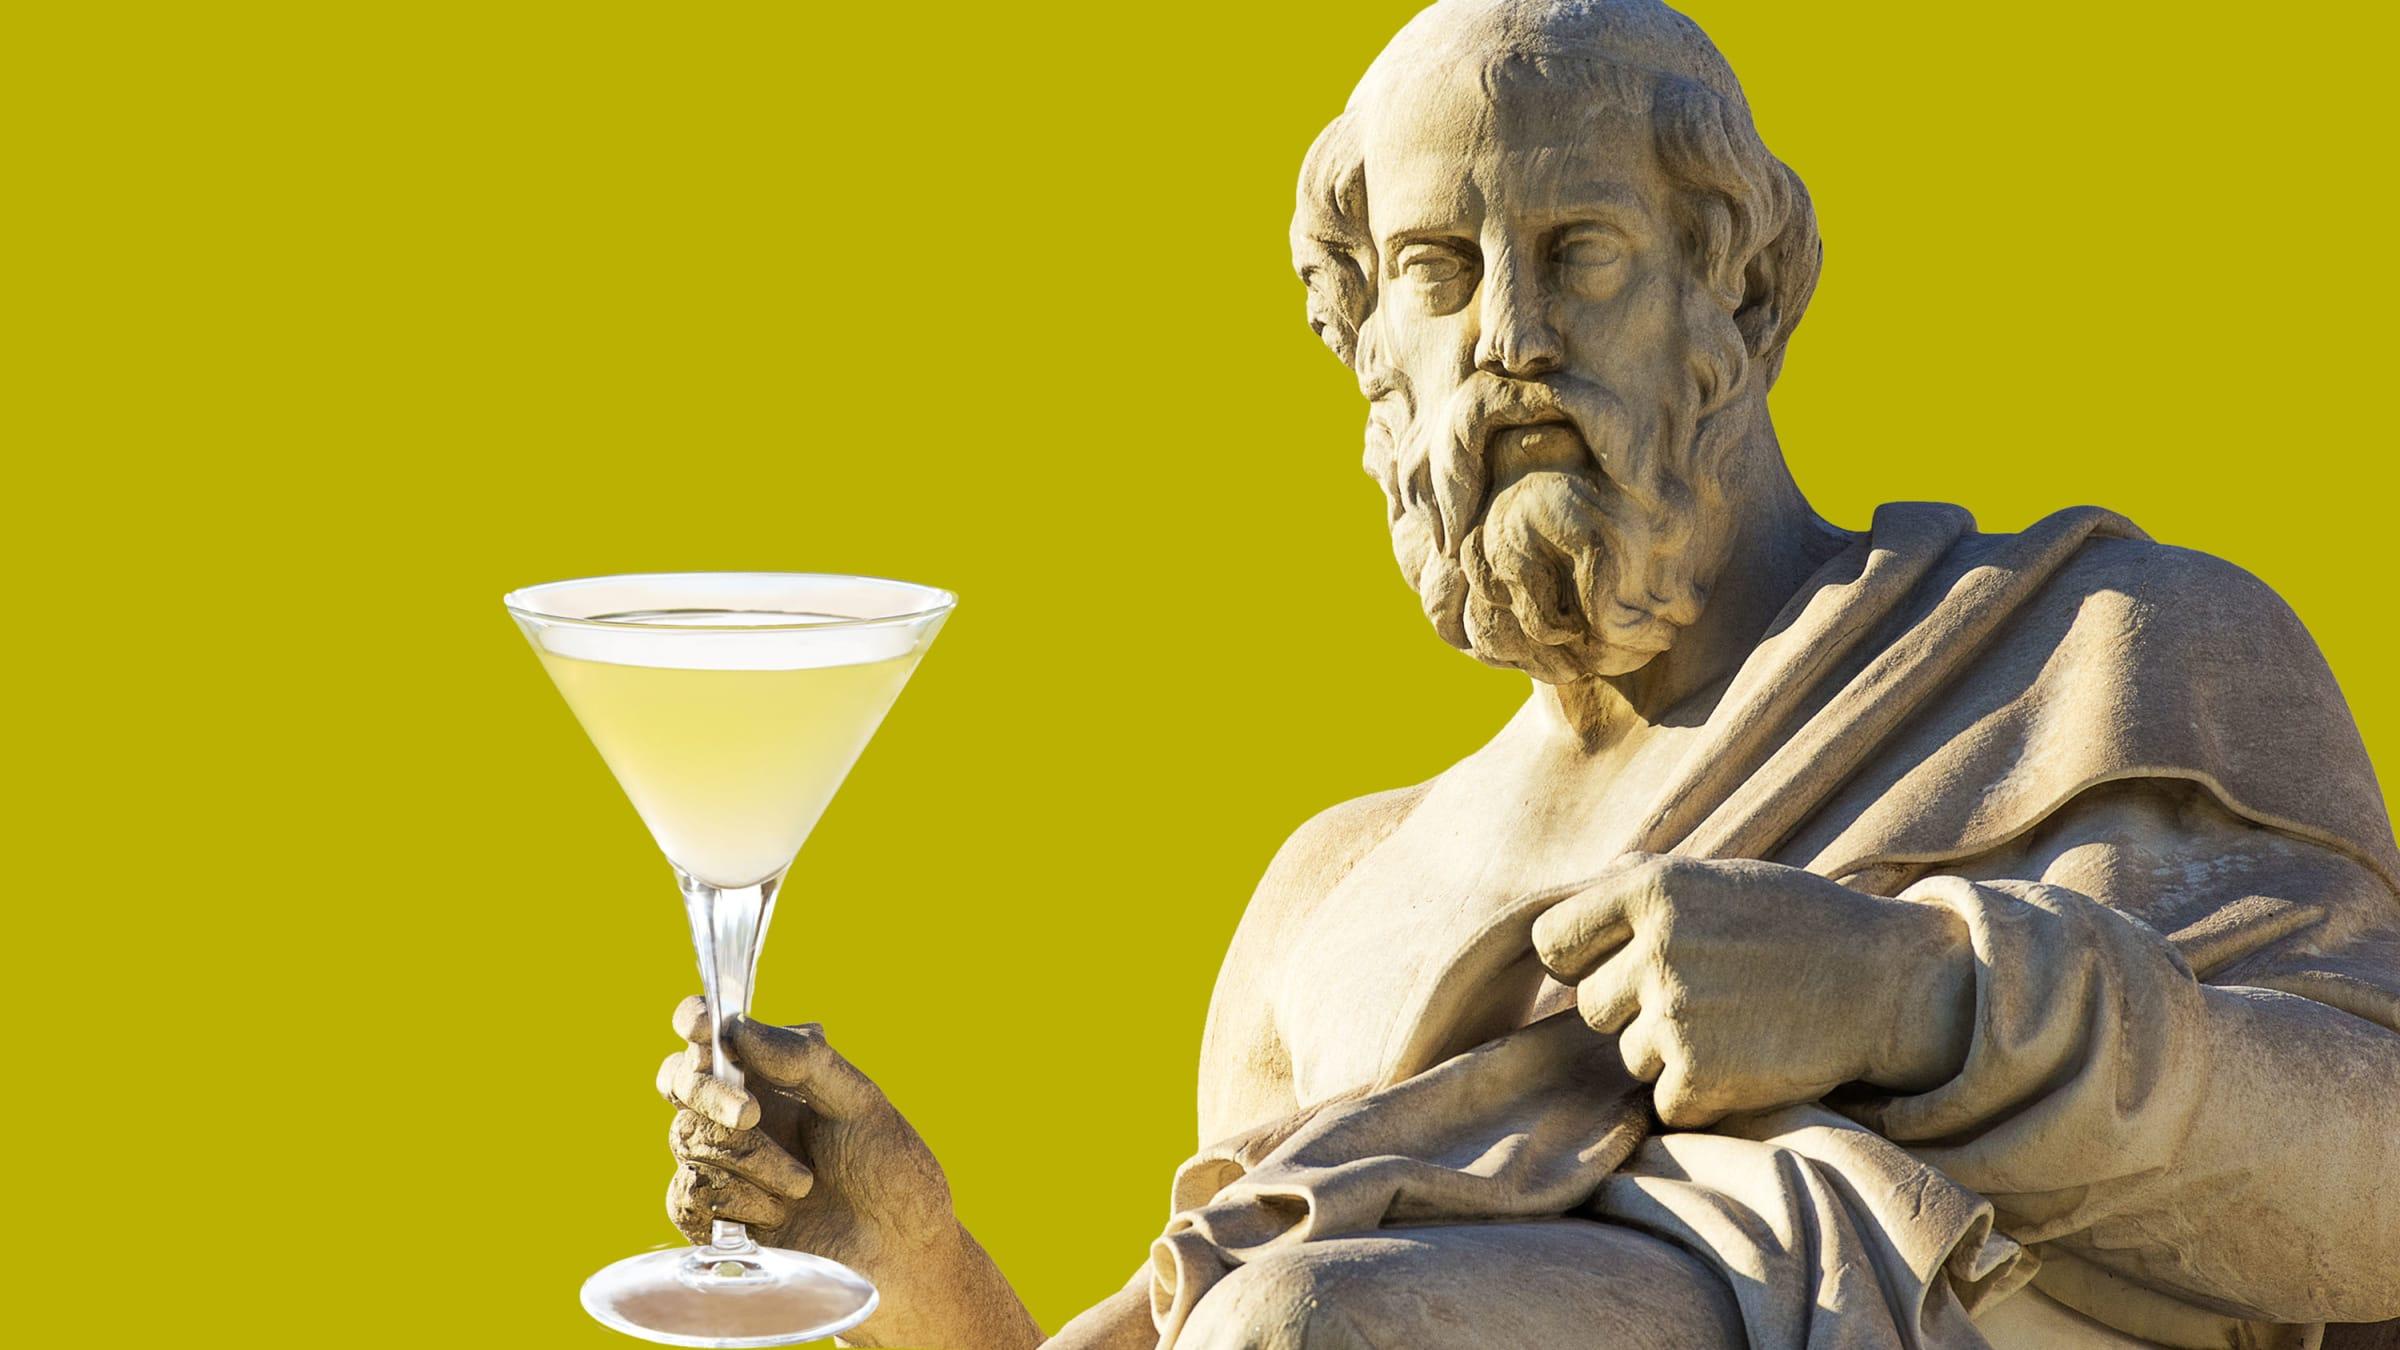 Plato & Aristotle Walk into a Bar A Meditation on the Daiquiri